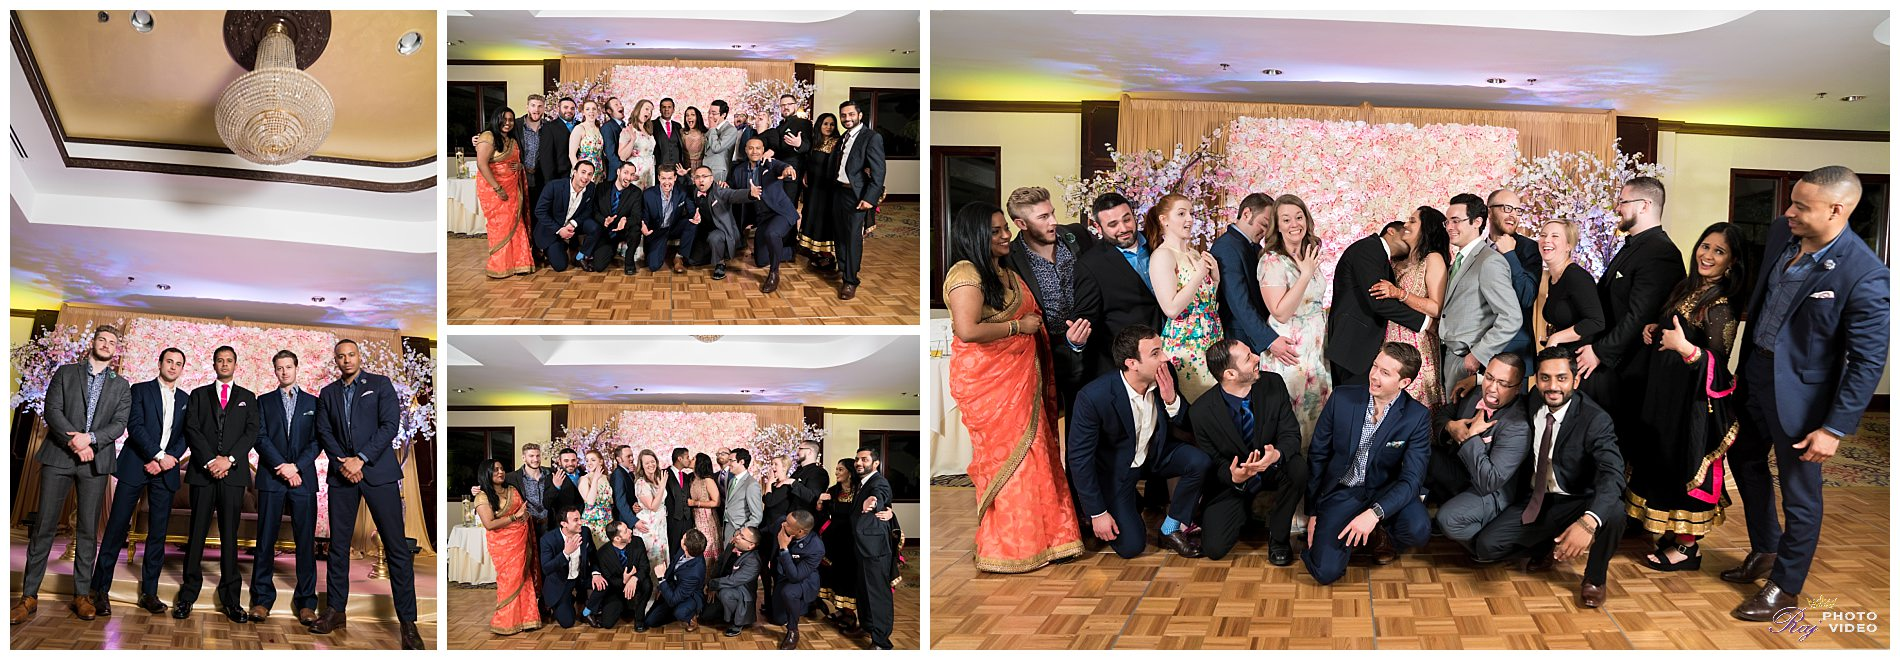 Martinsville-Gardens-NJ-Indian-Wedding-Ruchi-Vishal-70.jpg